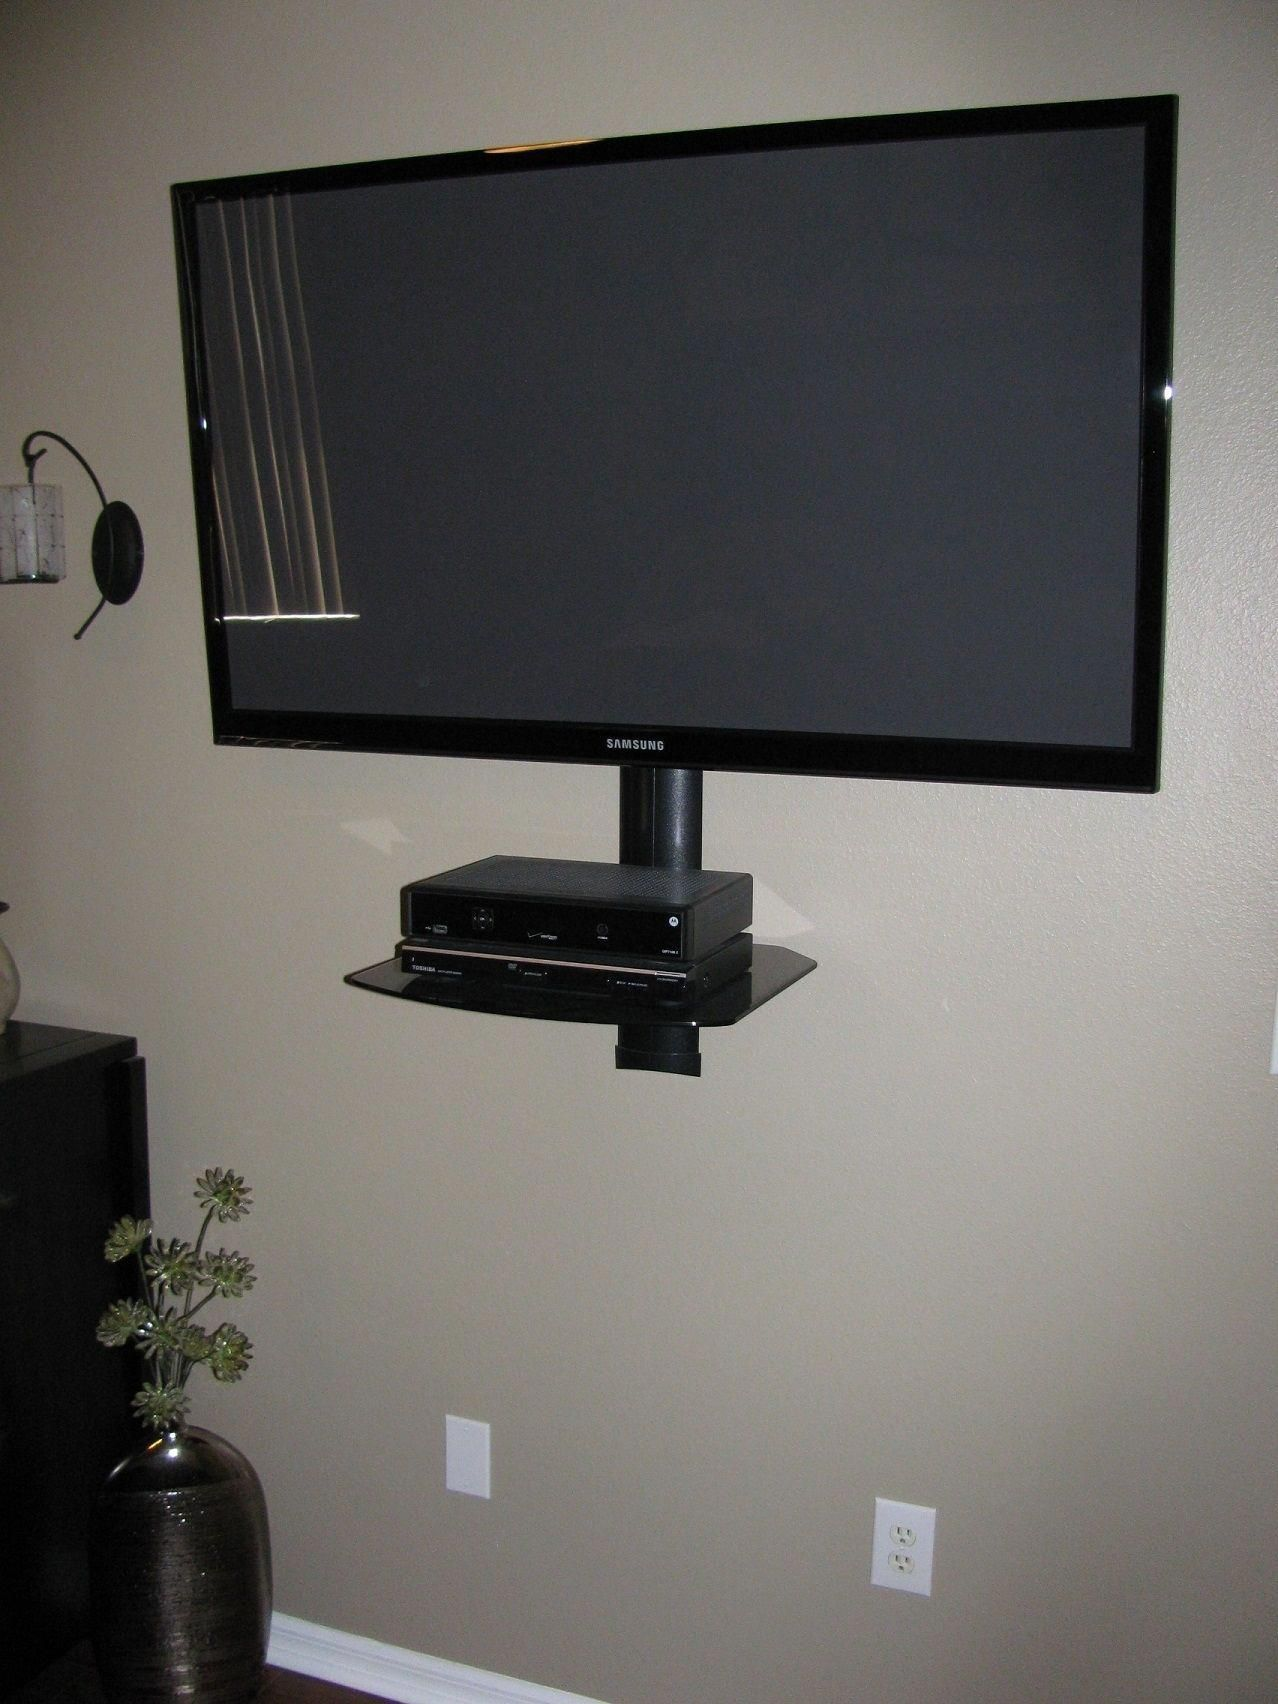 cable box shelves that fit on tv ekenasfiber johnhenriksson se u2022 rh ekenasfiber johnhenriksson se